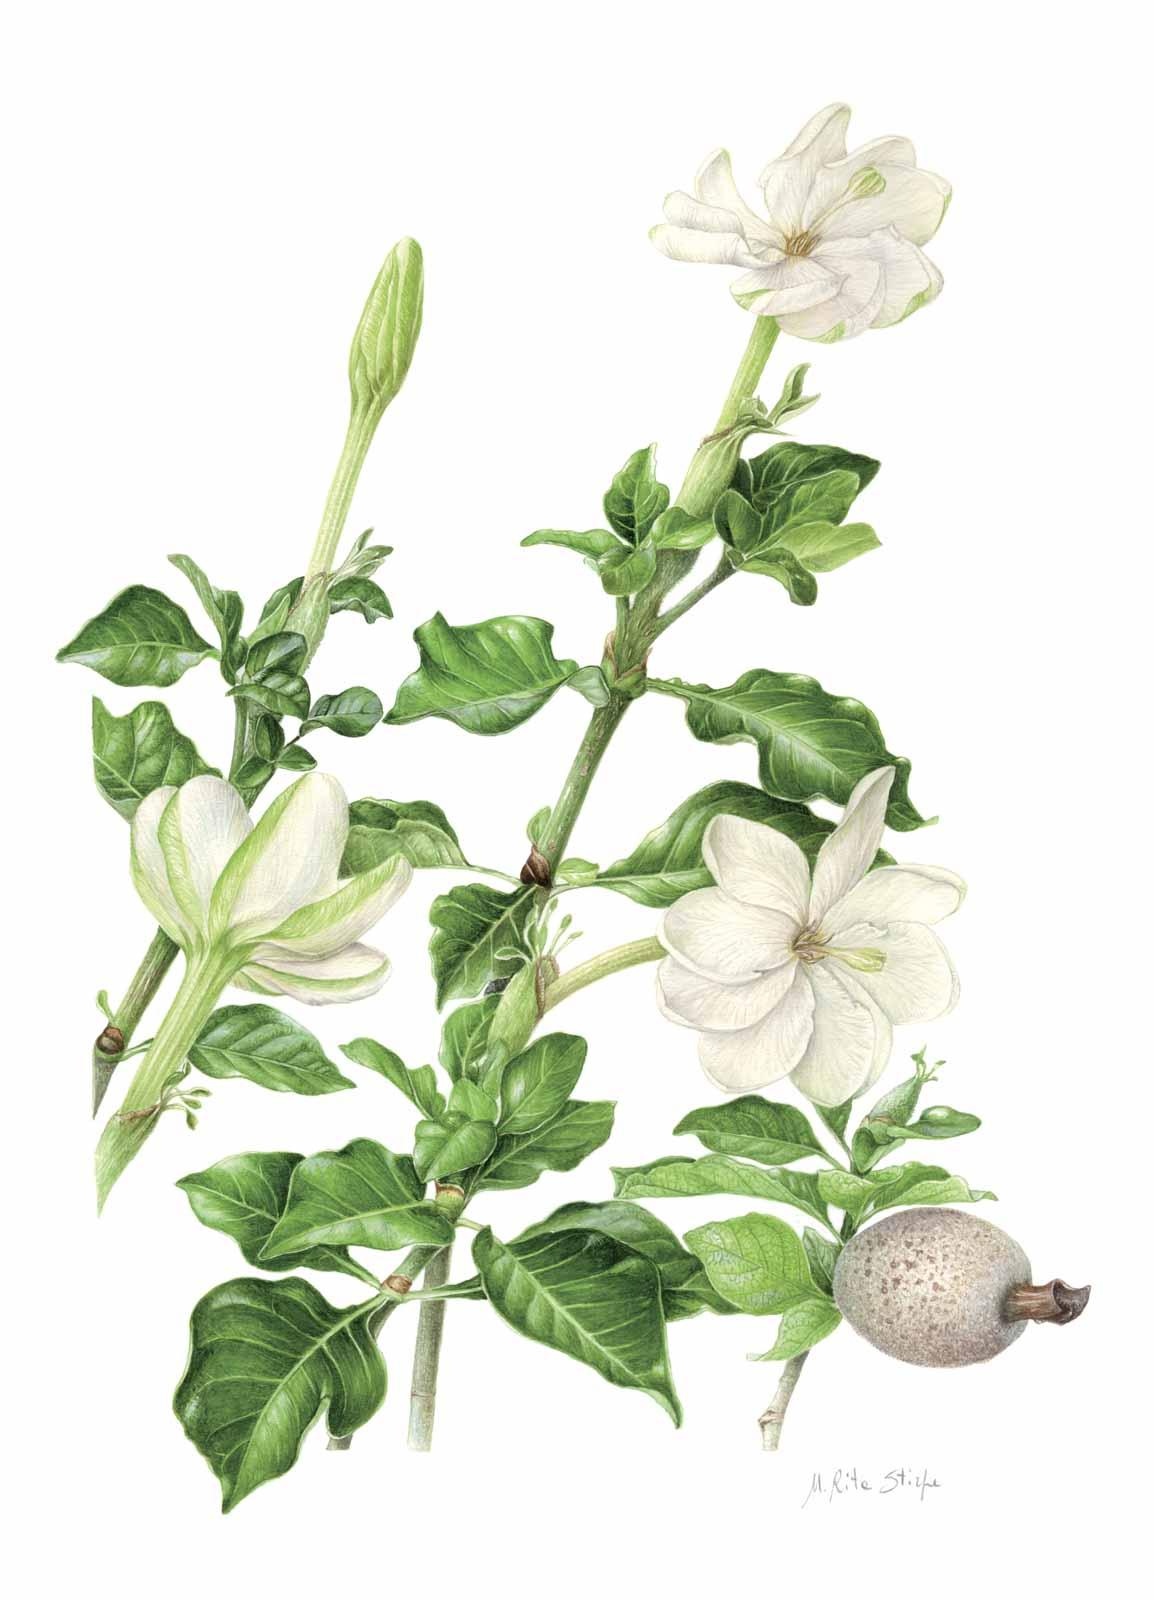 Catalogo - Ars Botanica - Stampa 08